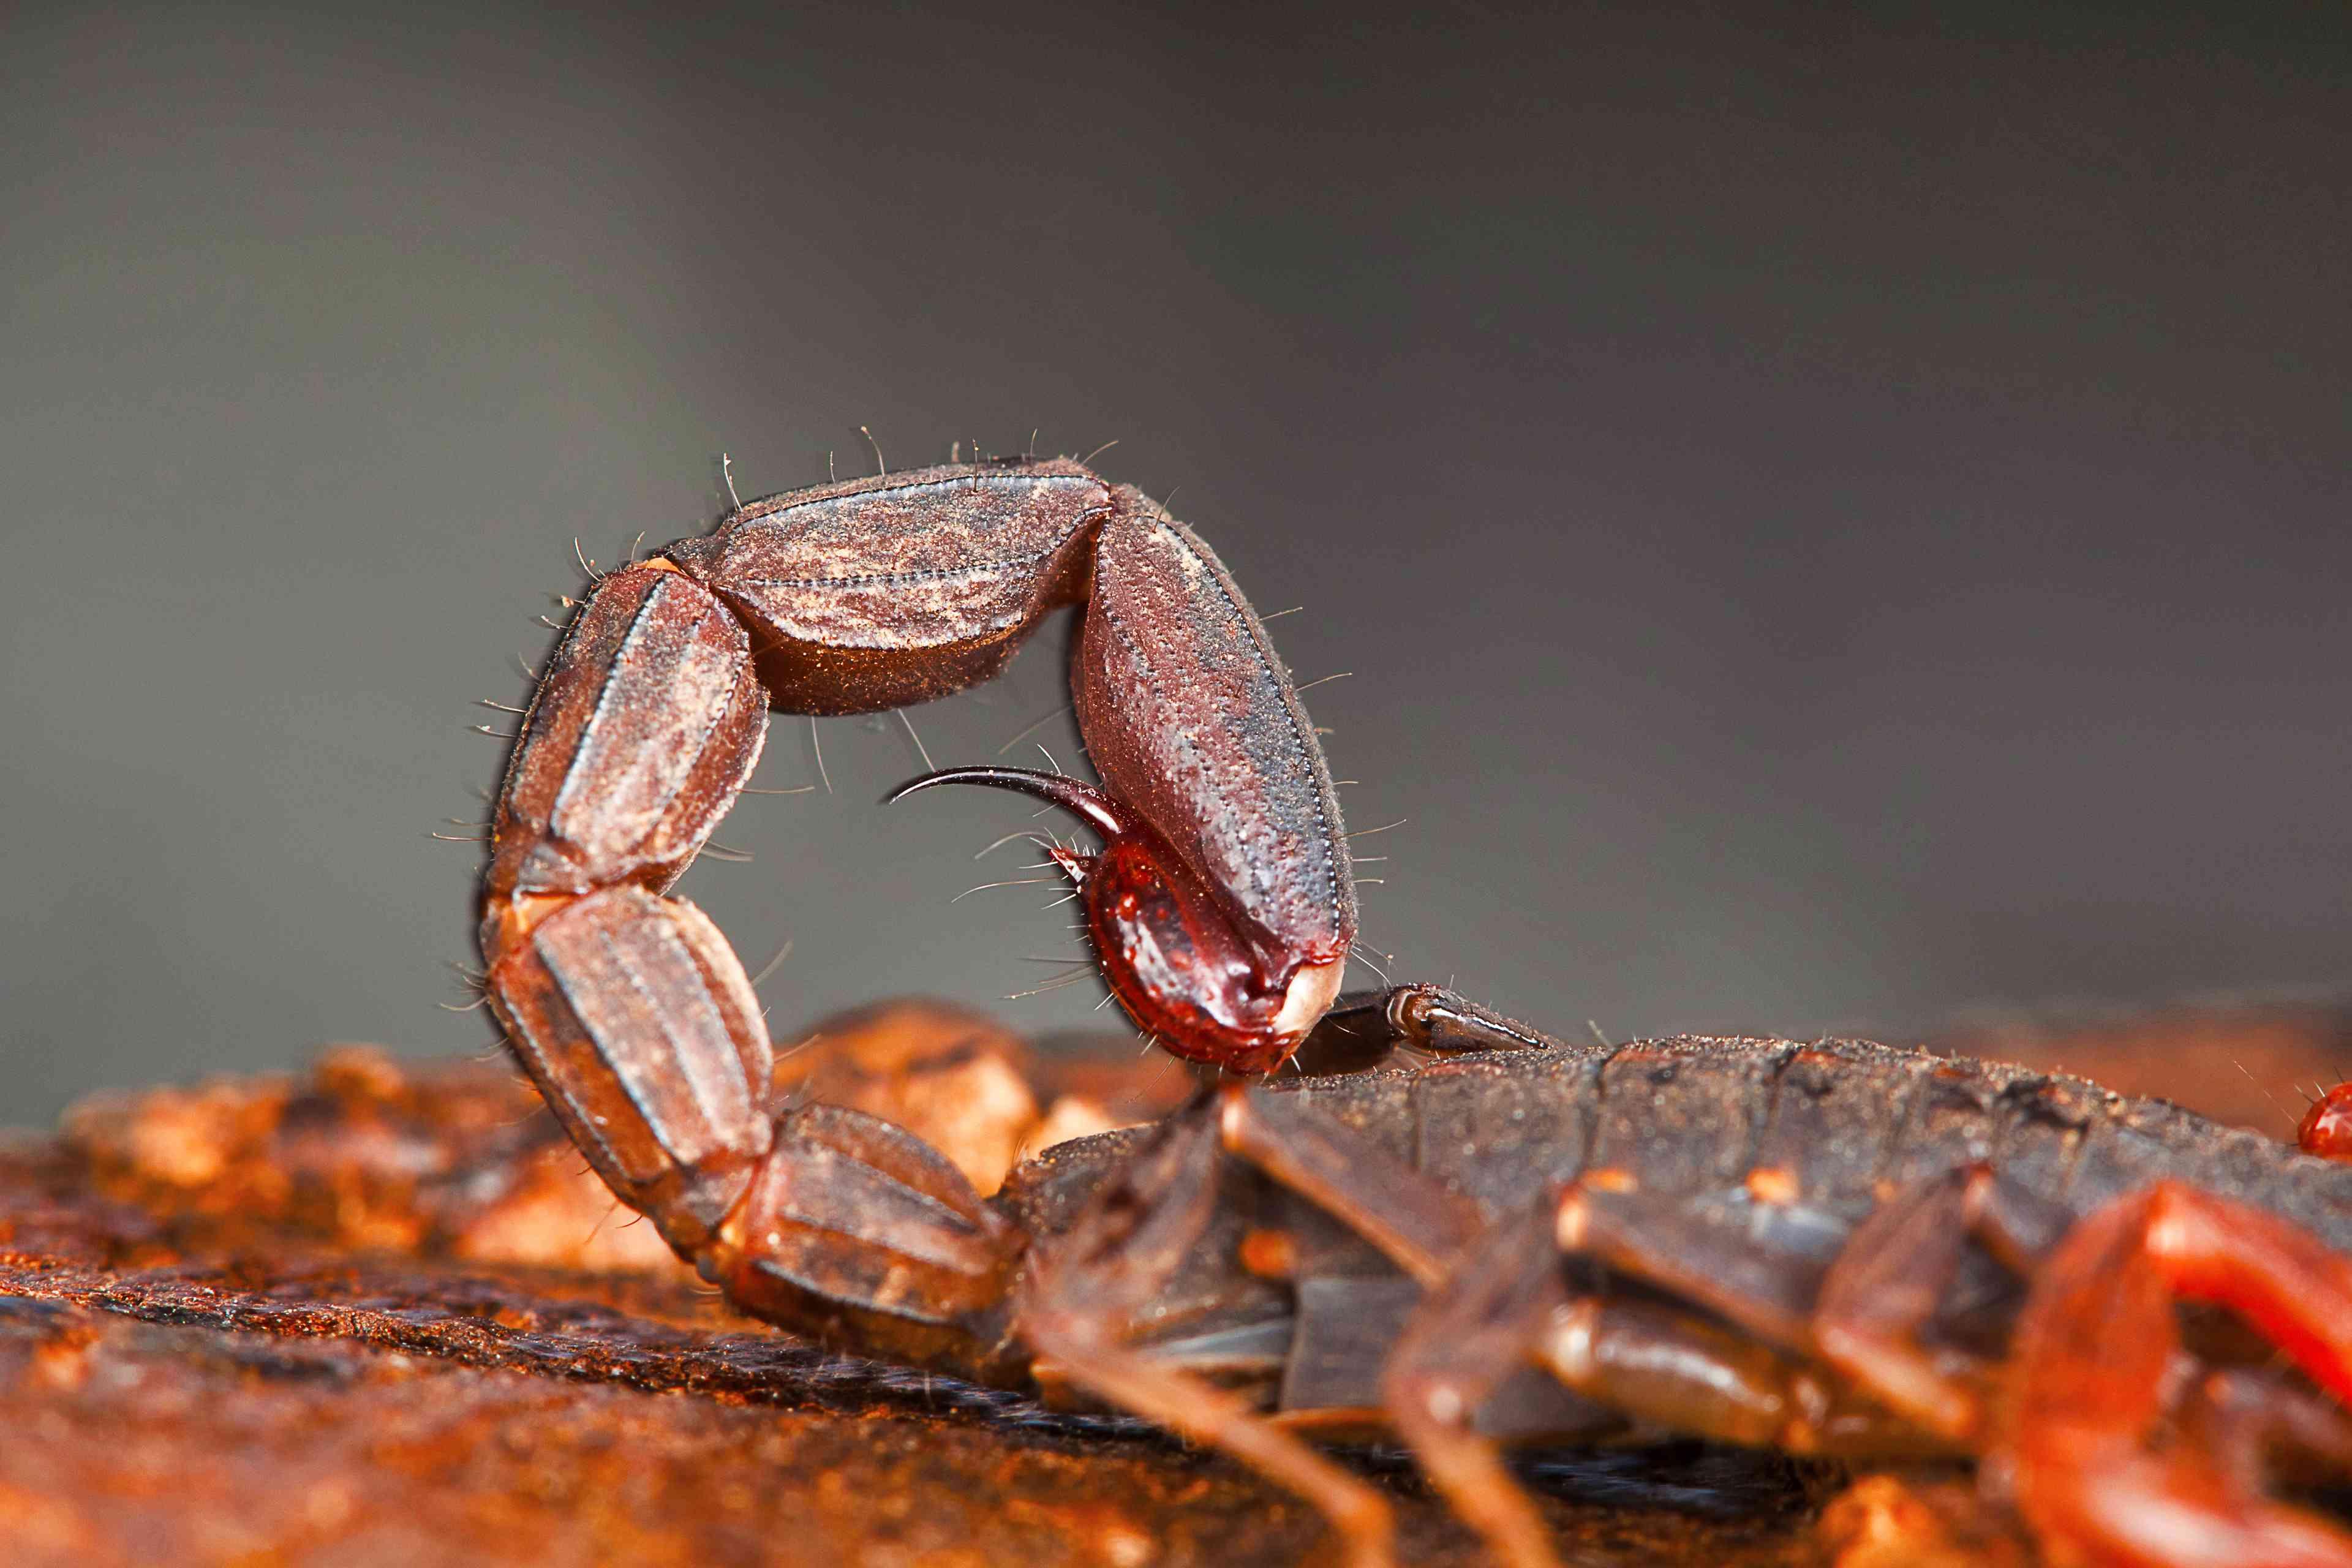 A three-keeled bark scorpion (Lychas tricarinatus) curls its metasoma at Udanti Tiger Reserve in Chhattisgarh, India.